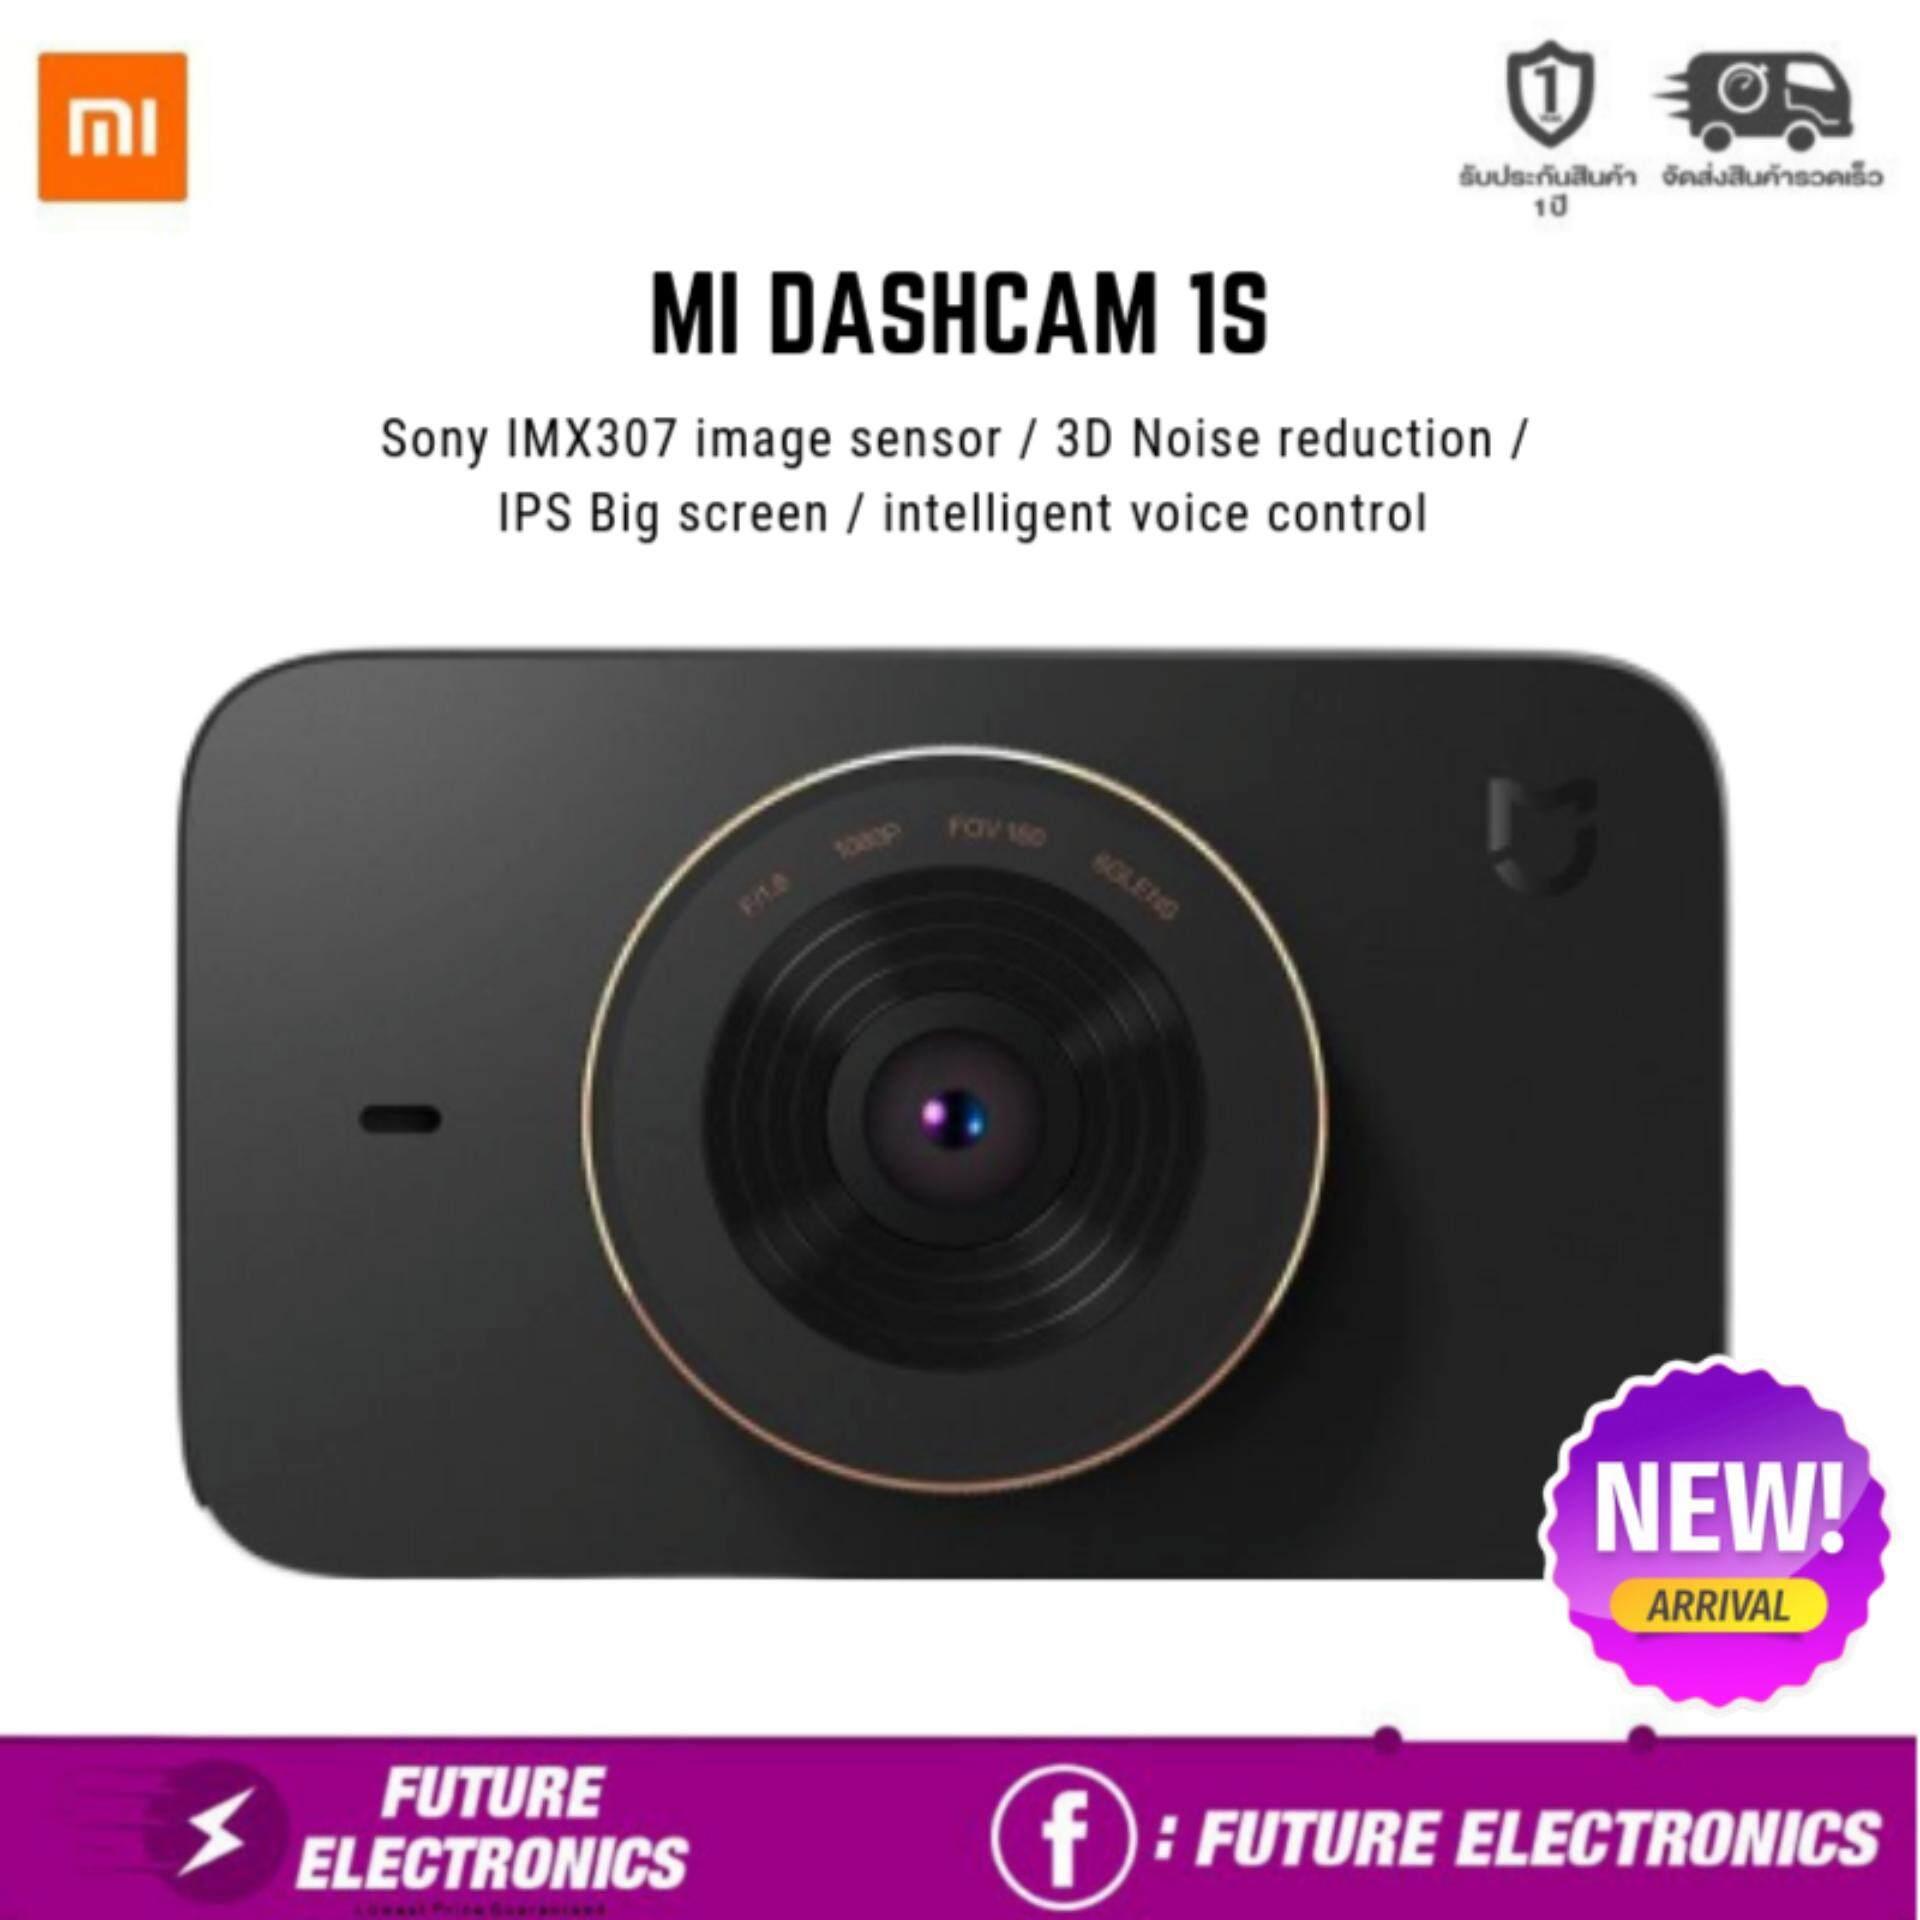 Mi Dash Cam 1s - Black  กล้องติดรถยนต์ ของแท้จาก Xiaomi รับประกันศูนย์ 1 ปี Future Electronics.